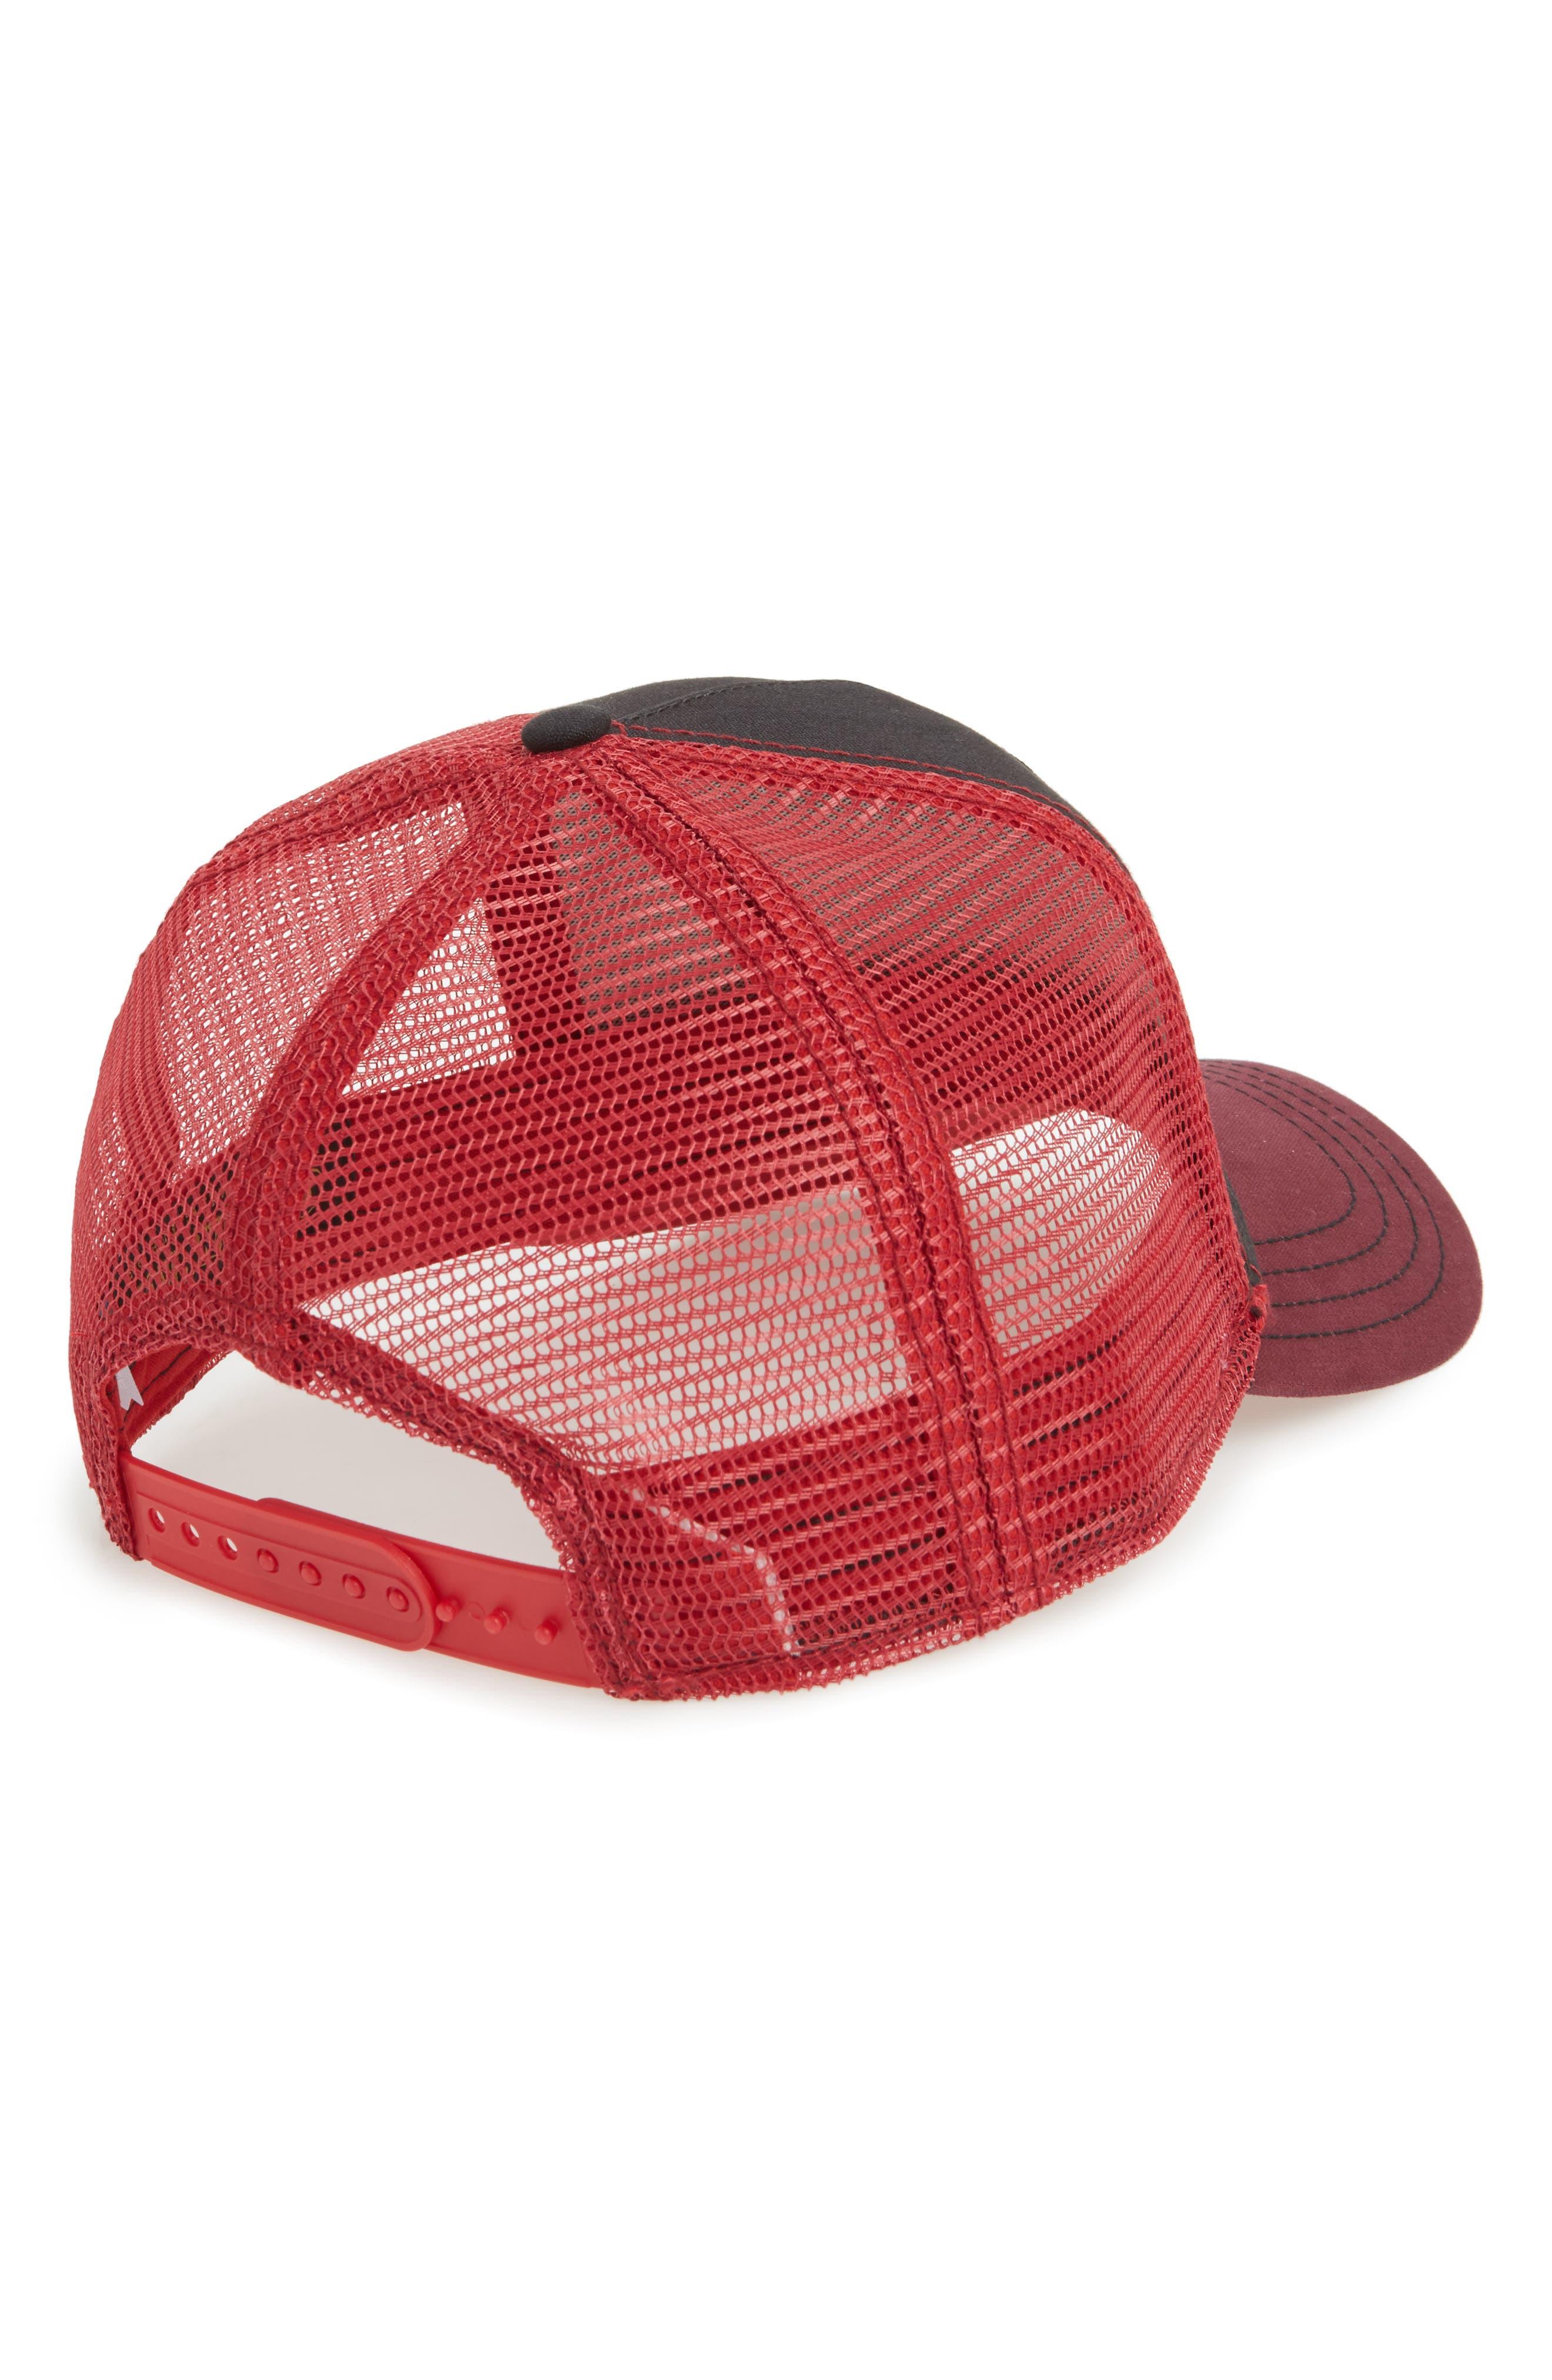 Barnyard King Trucker Hat,                             Alternate thumbnail 2, color,                             BLACK